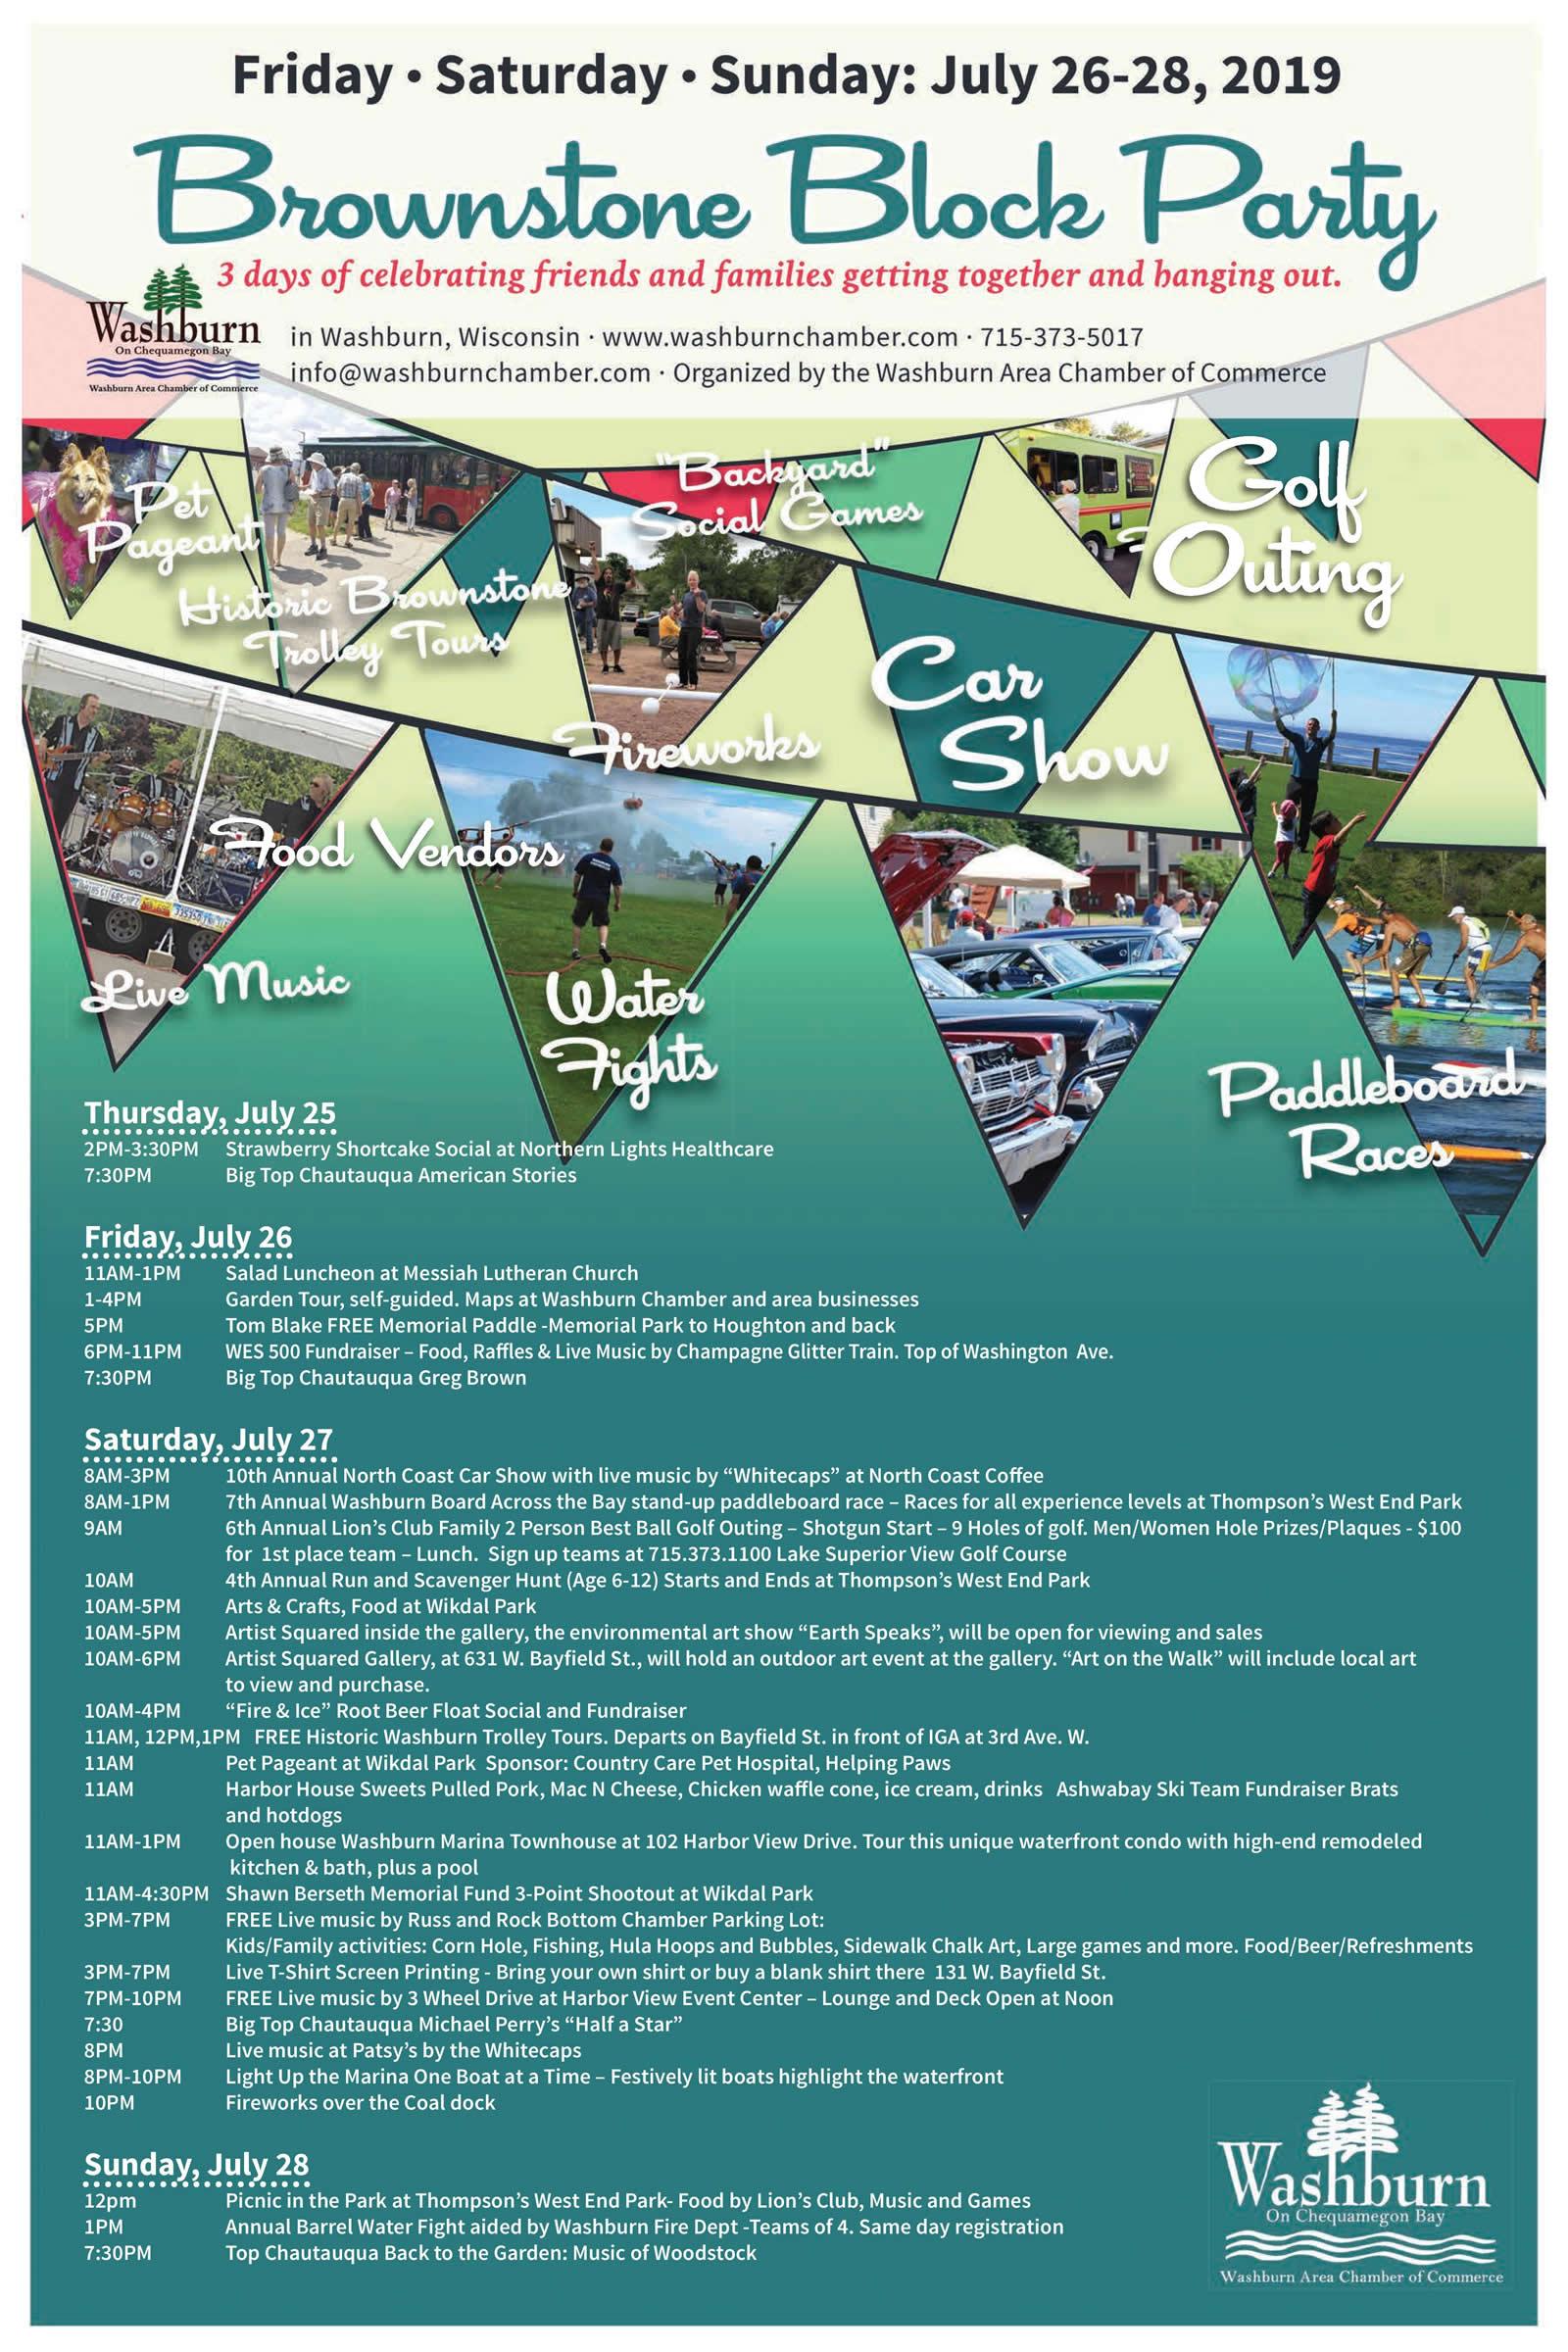 Brownstone Summerfest Block Party